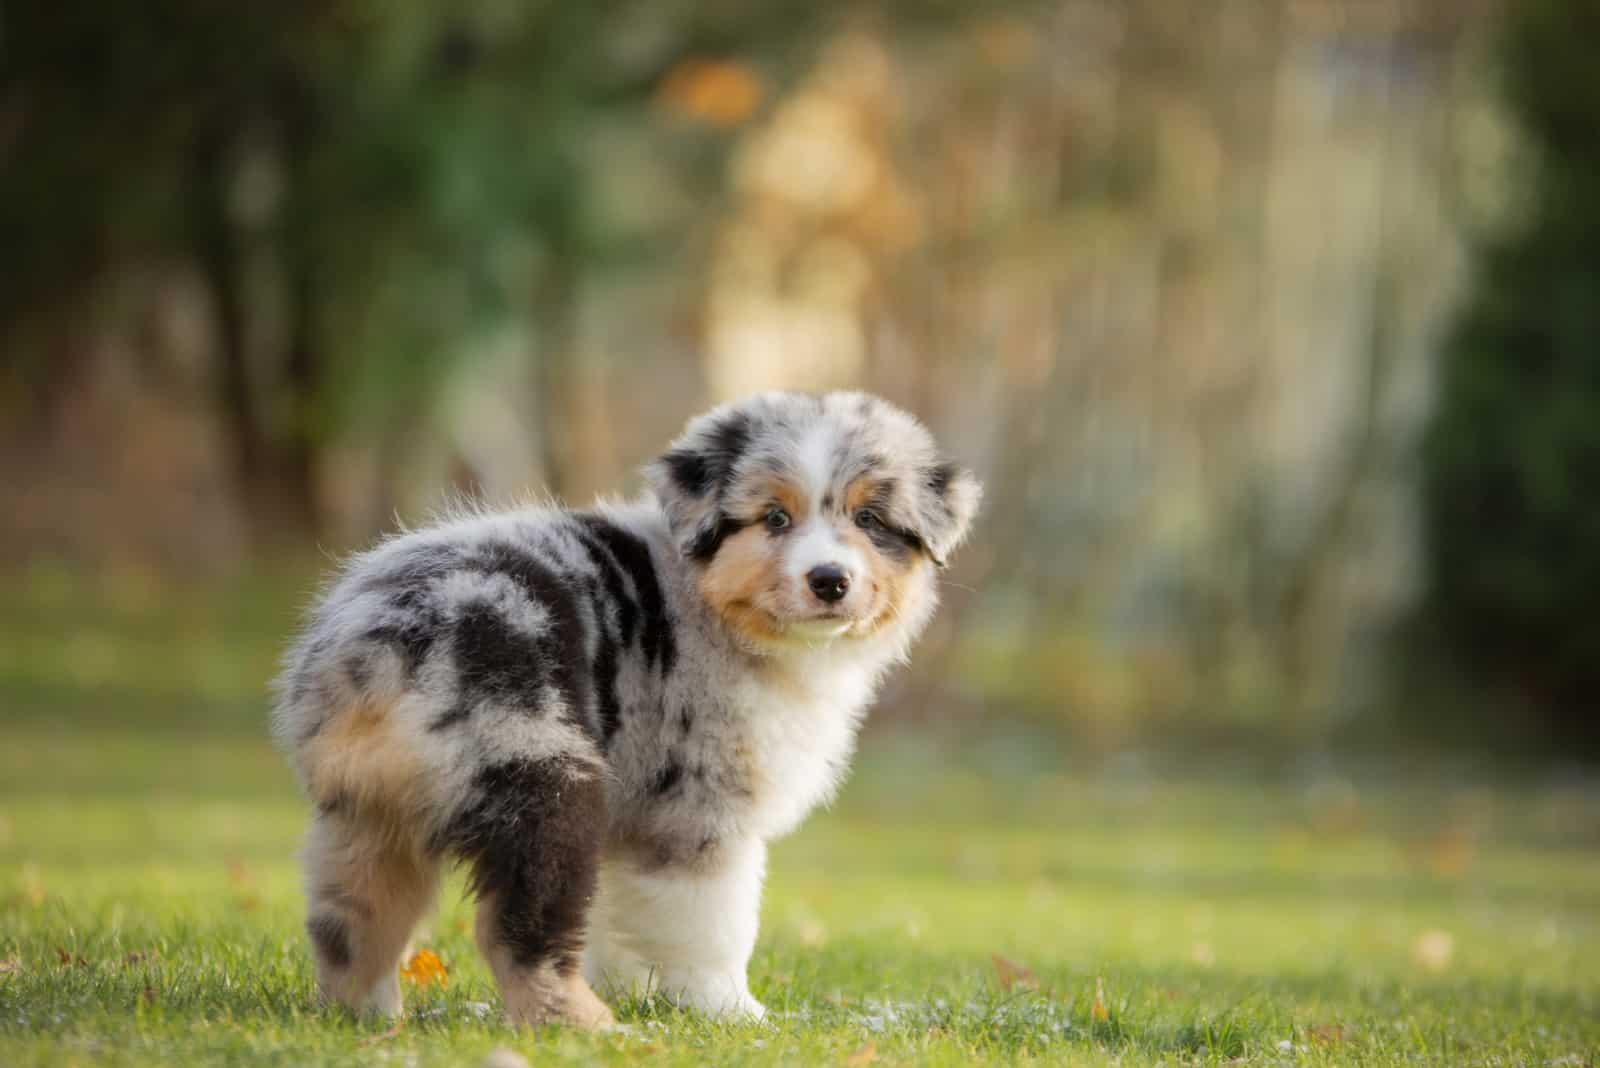 Hund im Hof auf dem Rasen